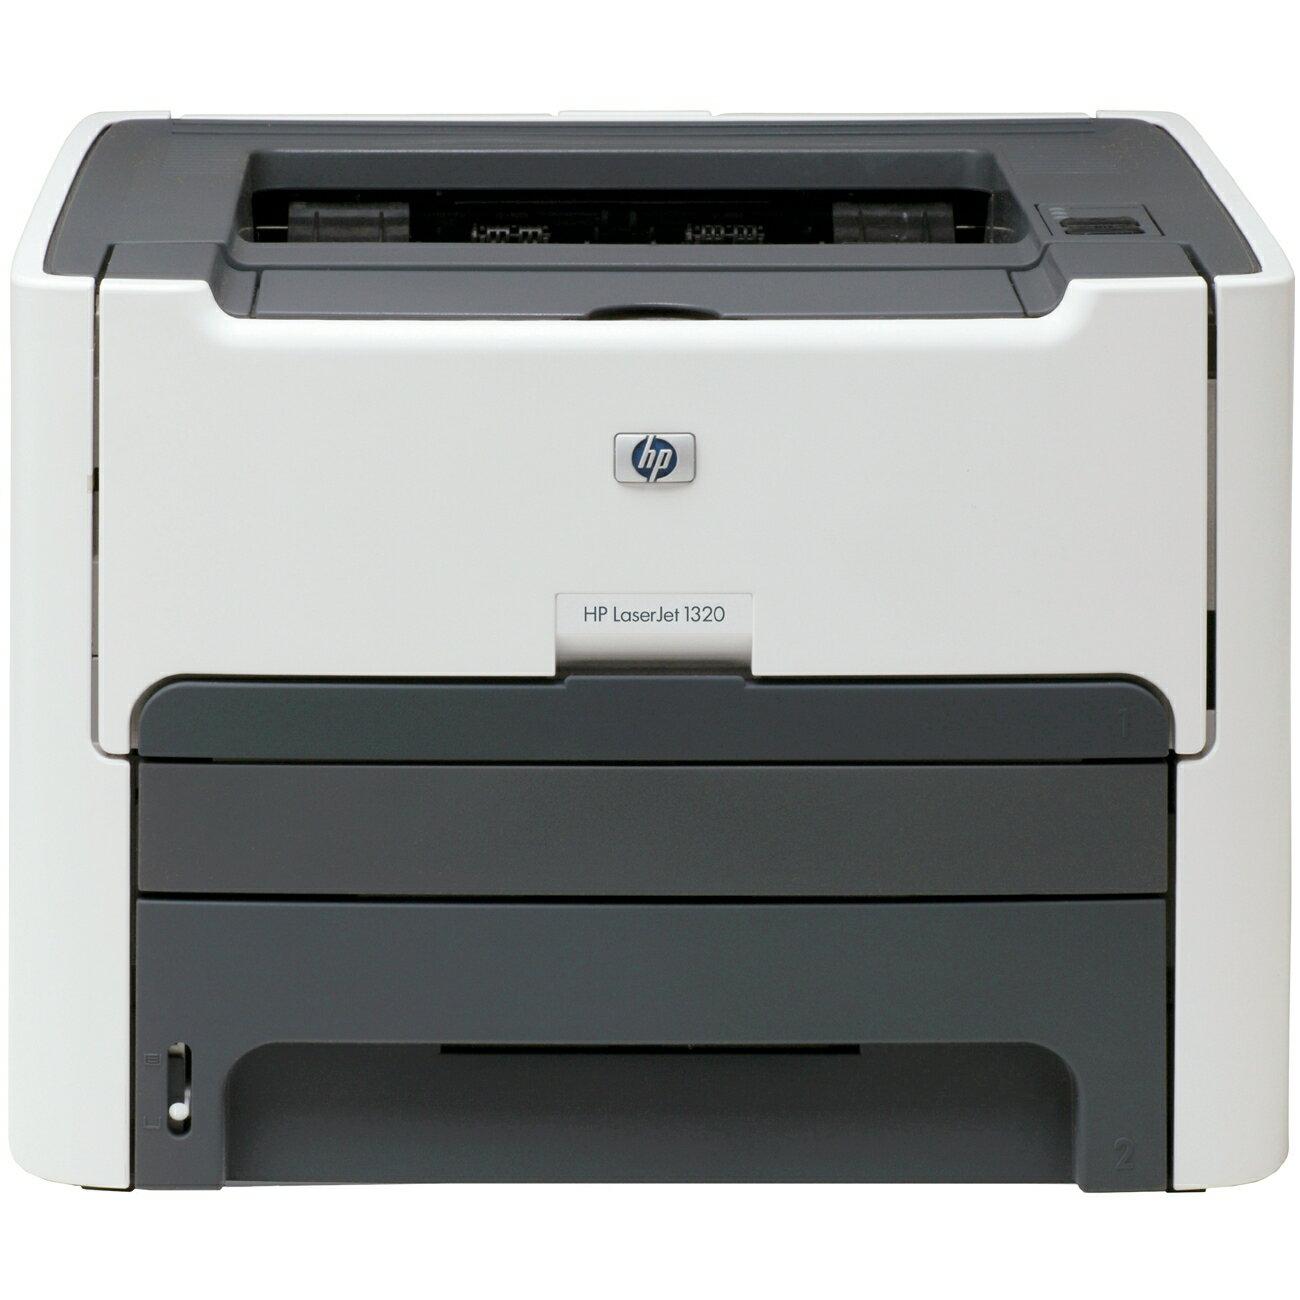 HP LaserJet 1320 Printer 0